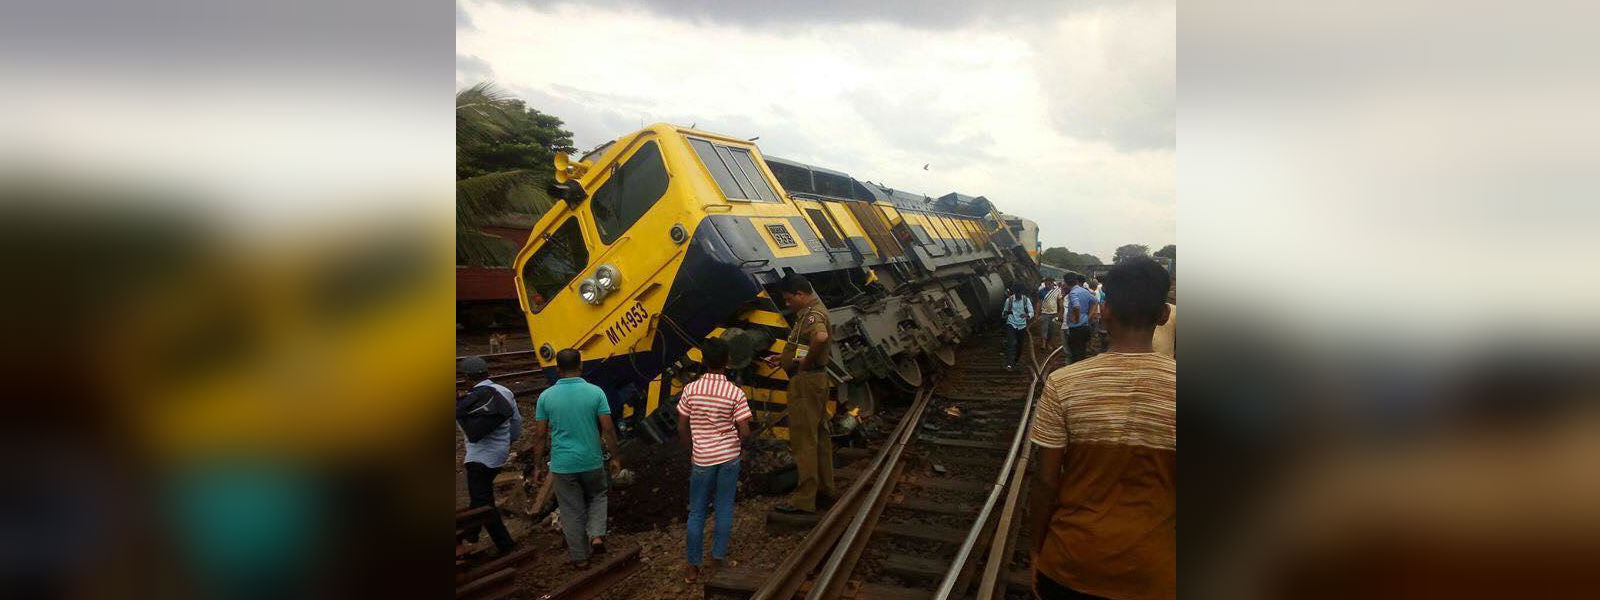 Train derailed in Maradana